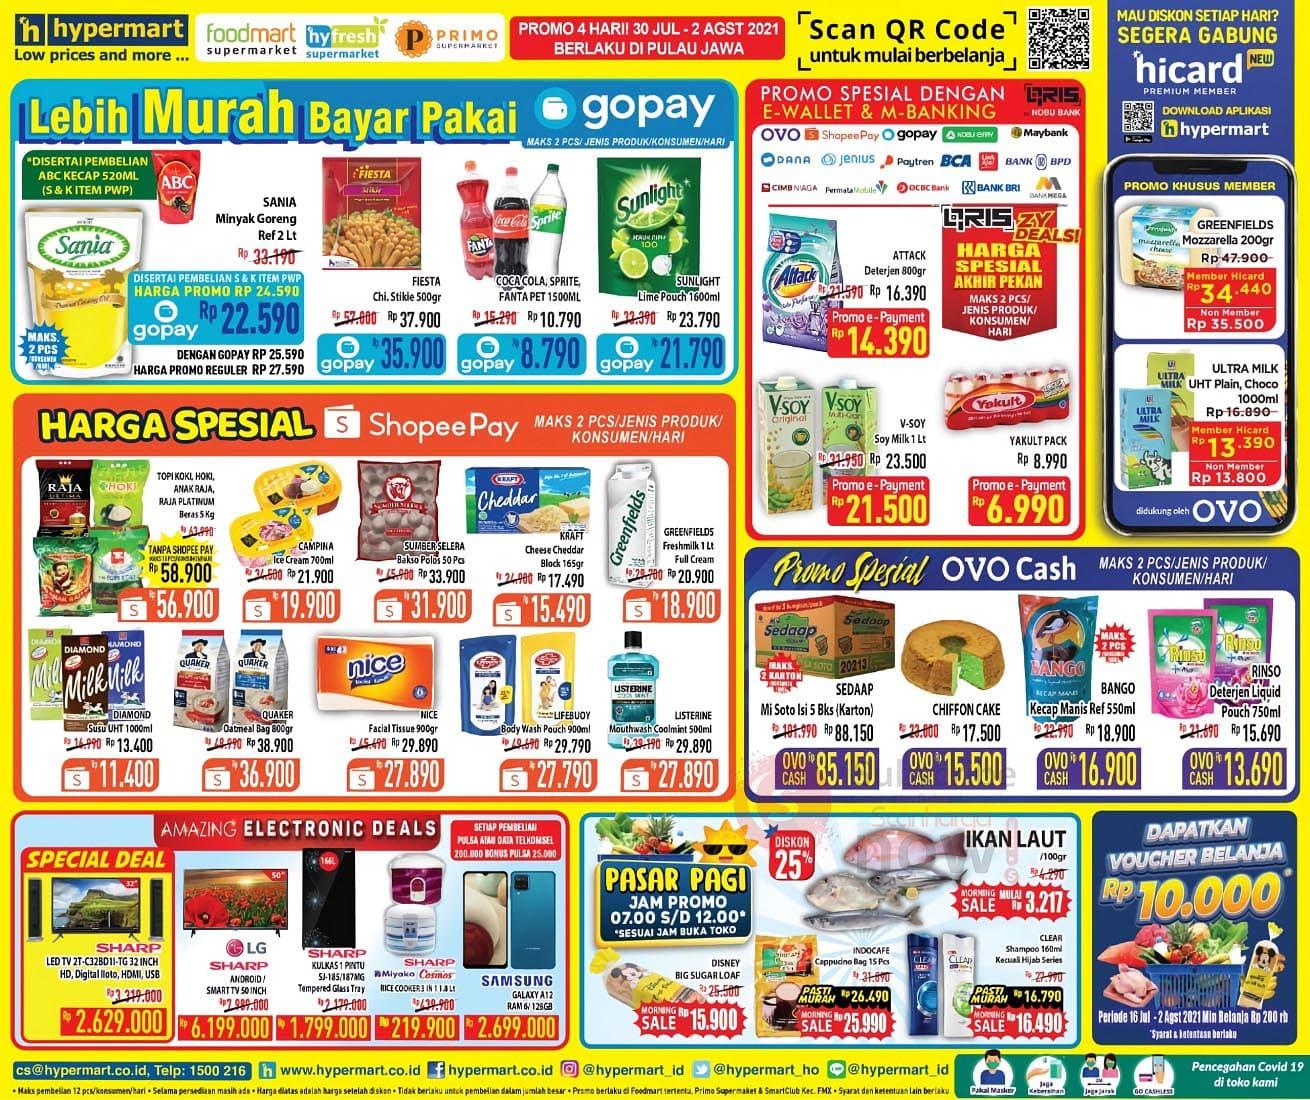 Katalog Promo Hypermart Weekend 30 Juli - 2 Agustus 2021 2